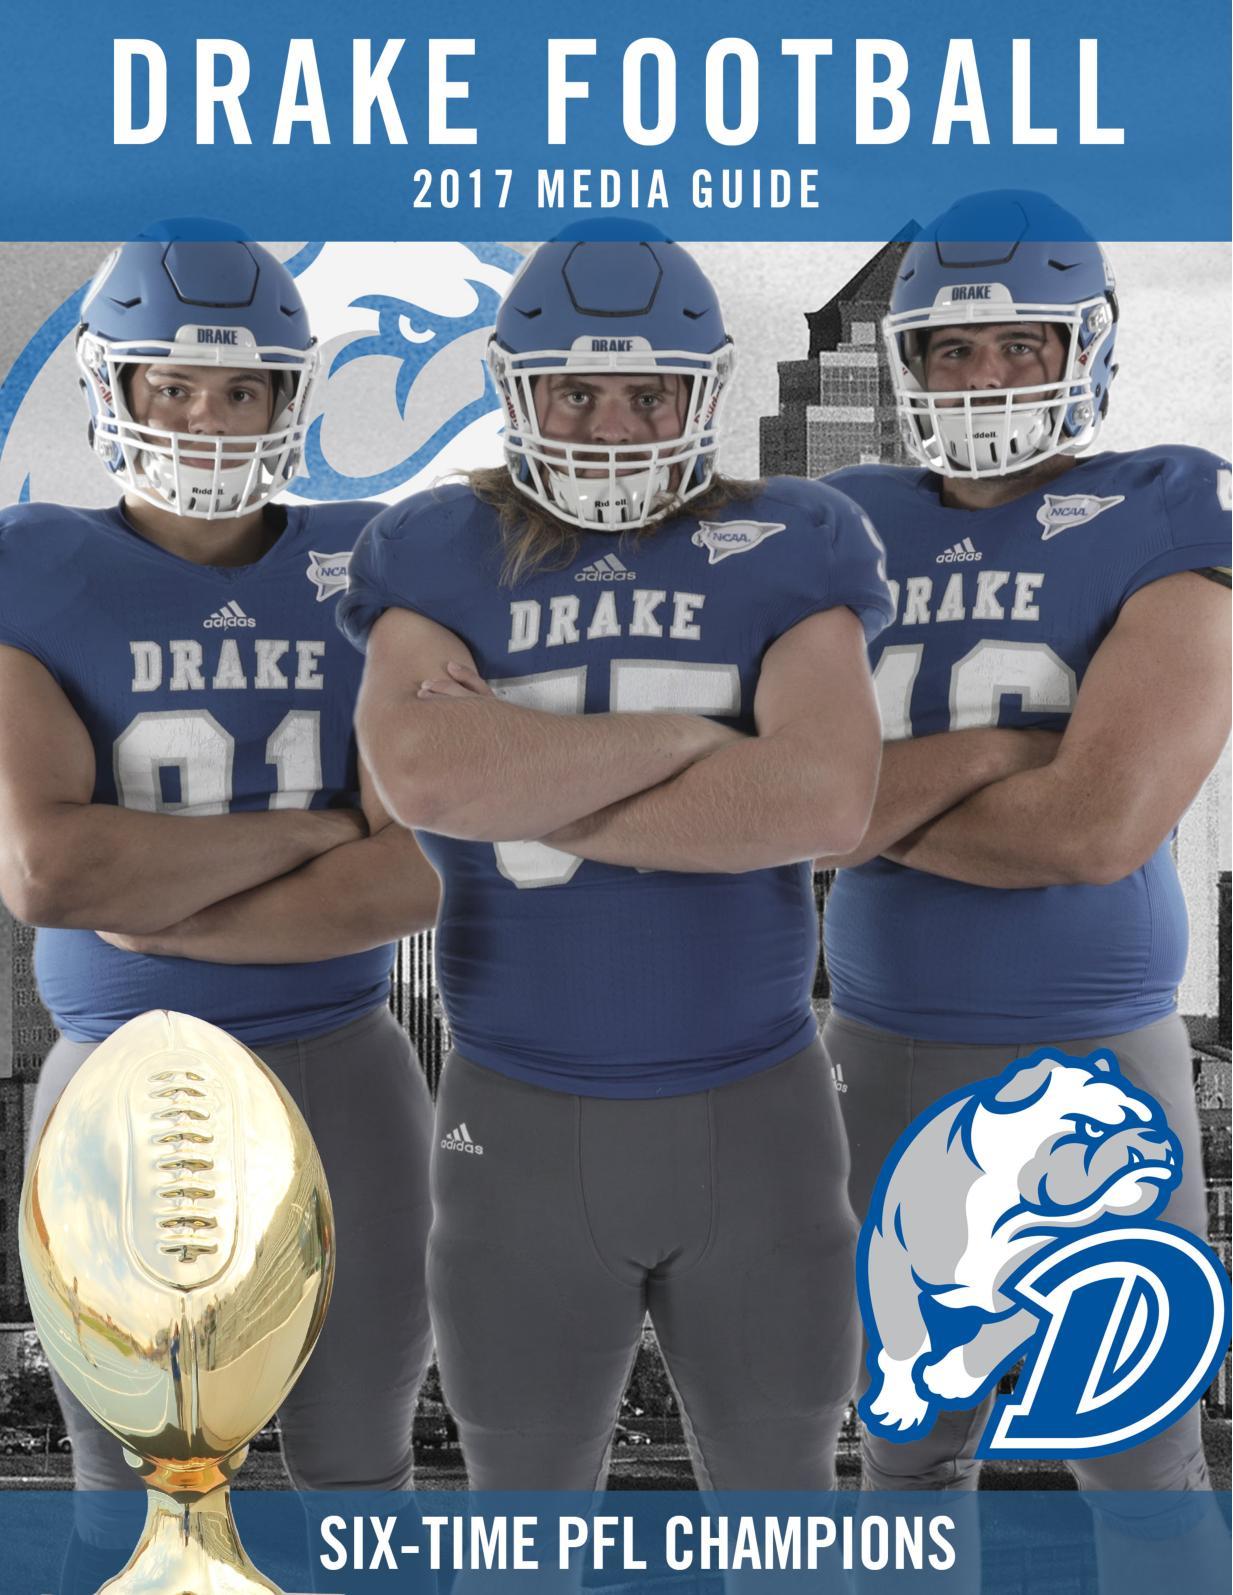 7010efbcb Calaméo - 2017 Drake Football Media Guide